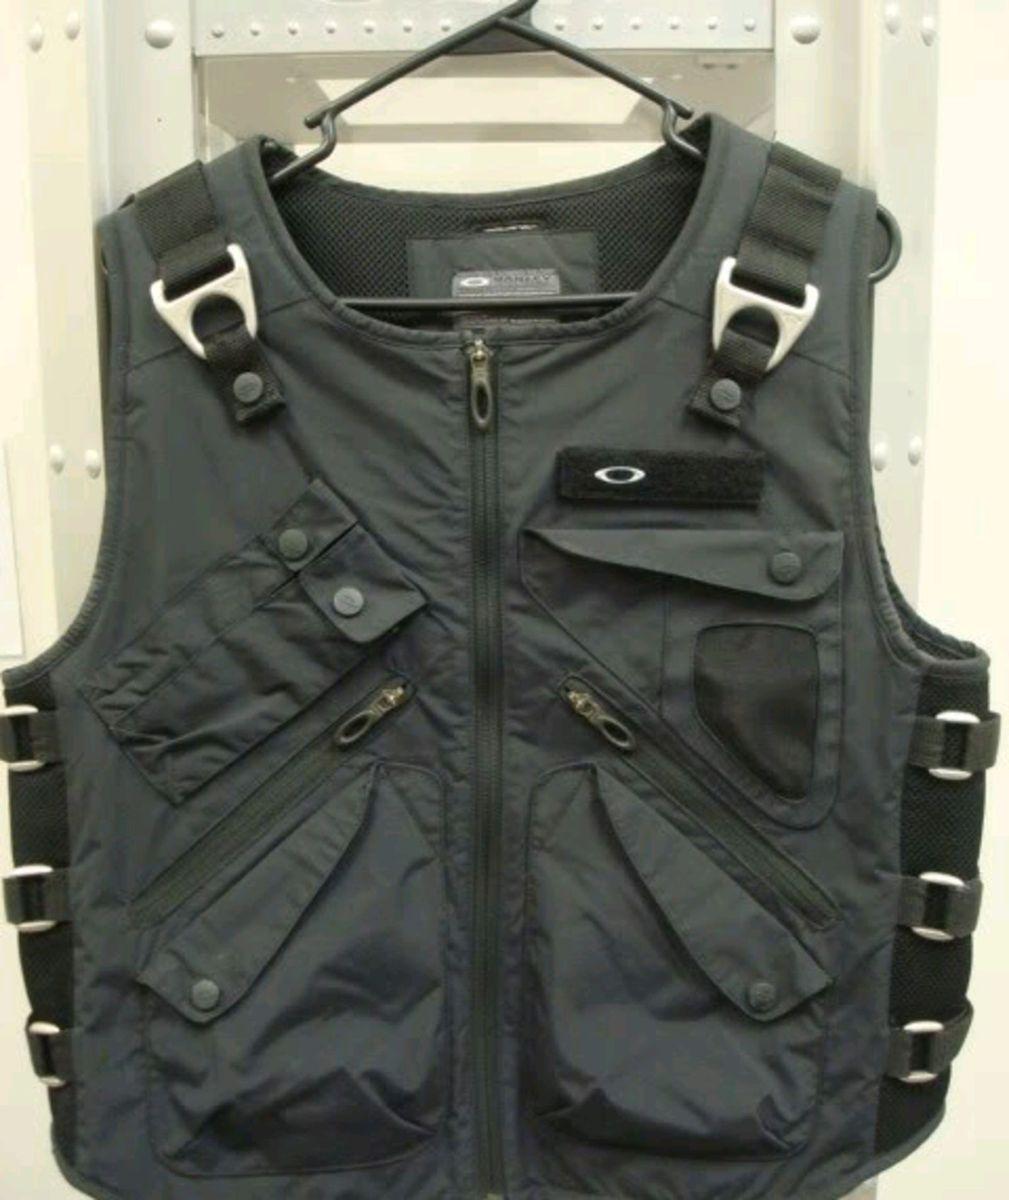 oakley ap vest masculino - coletes oakley.  Czm6ly9wag90b3muzw5qb2vplmnvbs5ici9wcm9kdwn0cy82mju5nduxlzvkngfhzgnhnguynzbhytu1zgrjnjuwzgvmytc4nta0lmpwzw  ... 7213a0a16d313